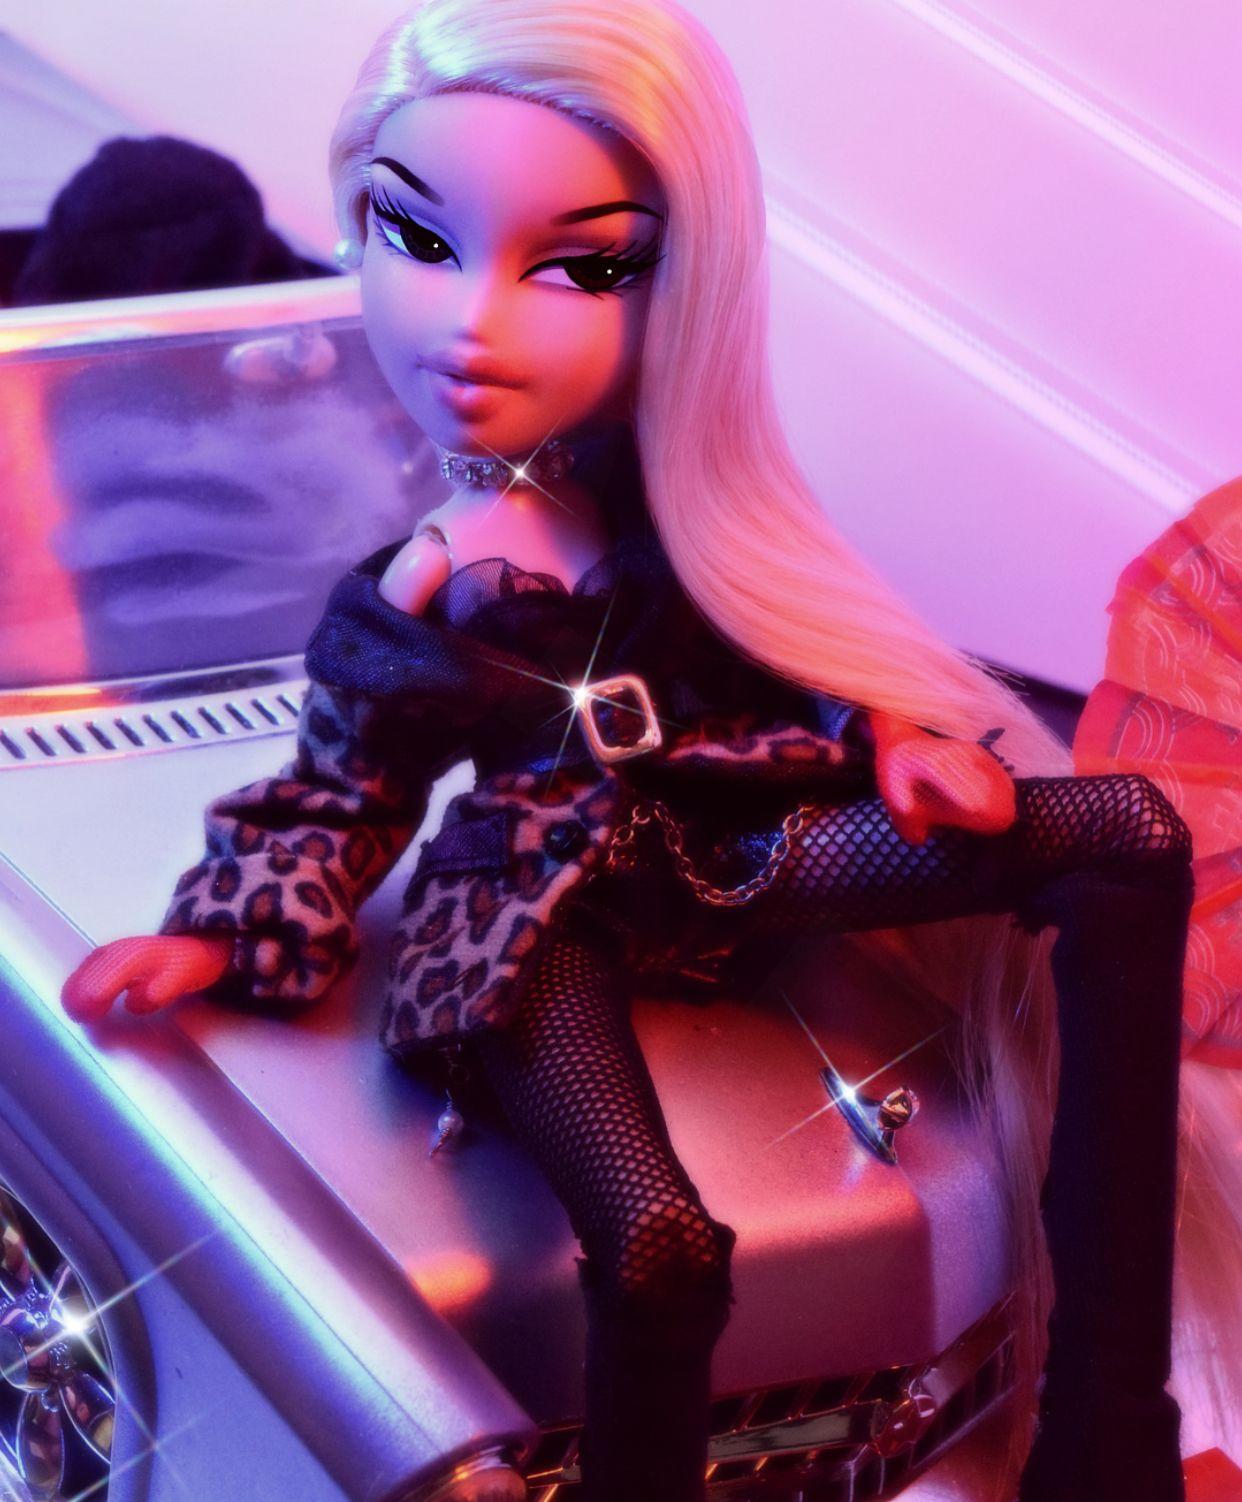 Barbie Wallpaper Tumblr: Pinterest : @shesoglorious